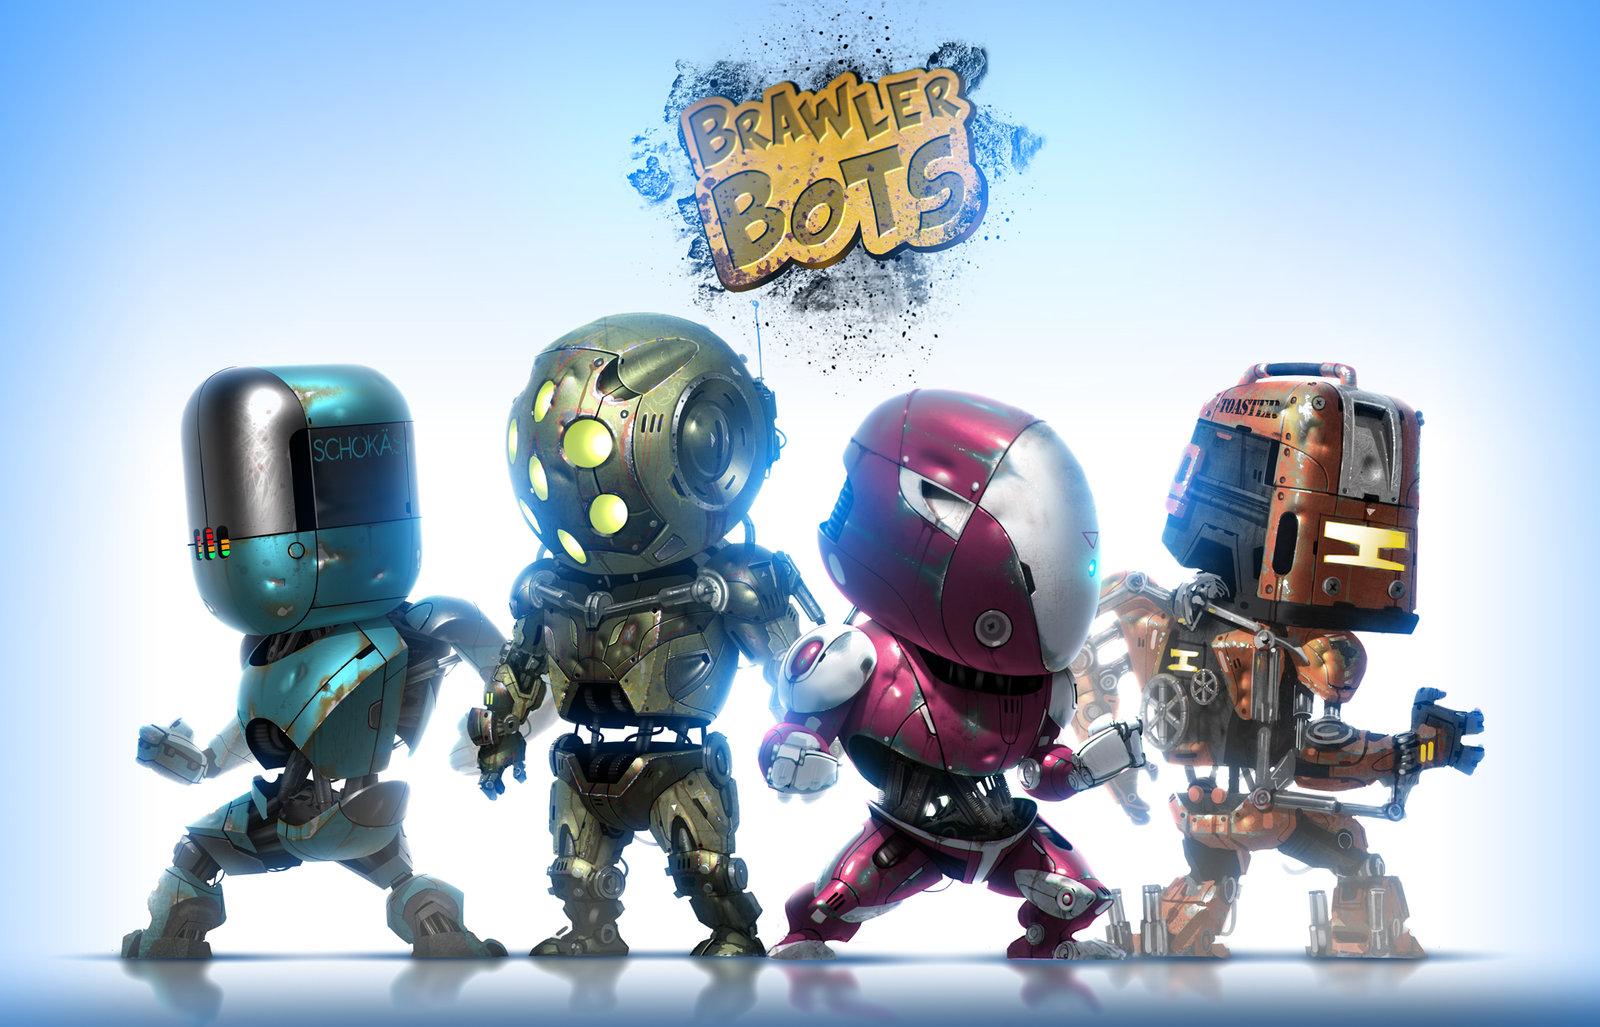 Brawler Bots